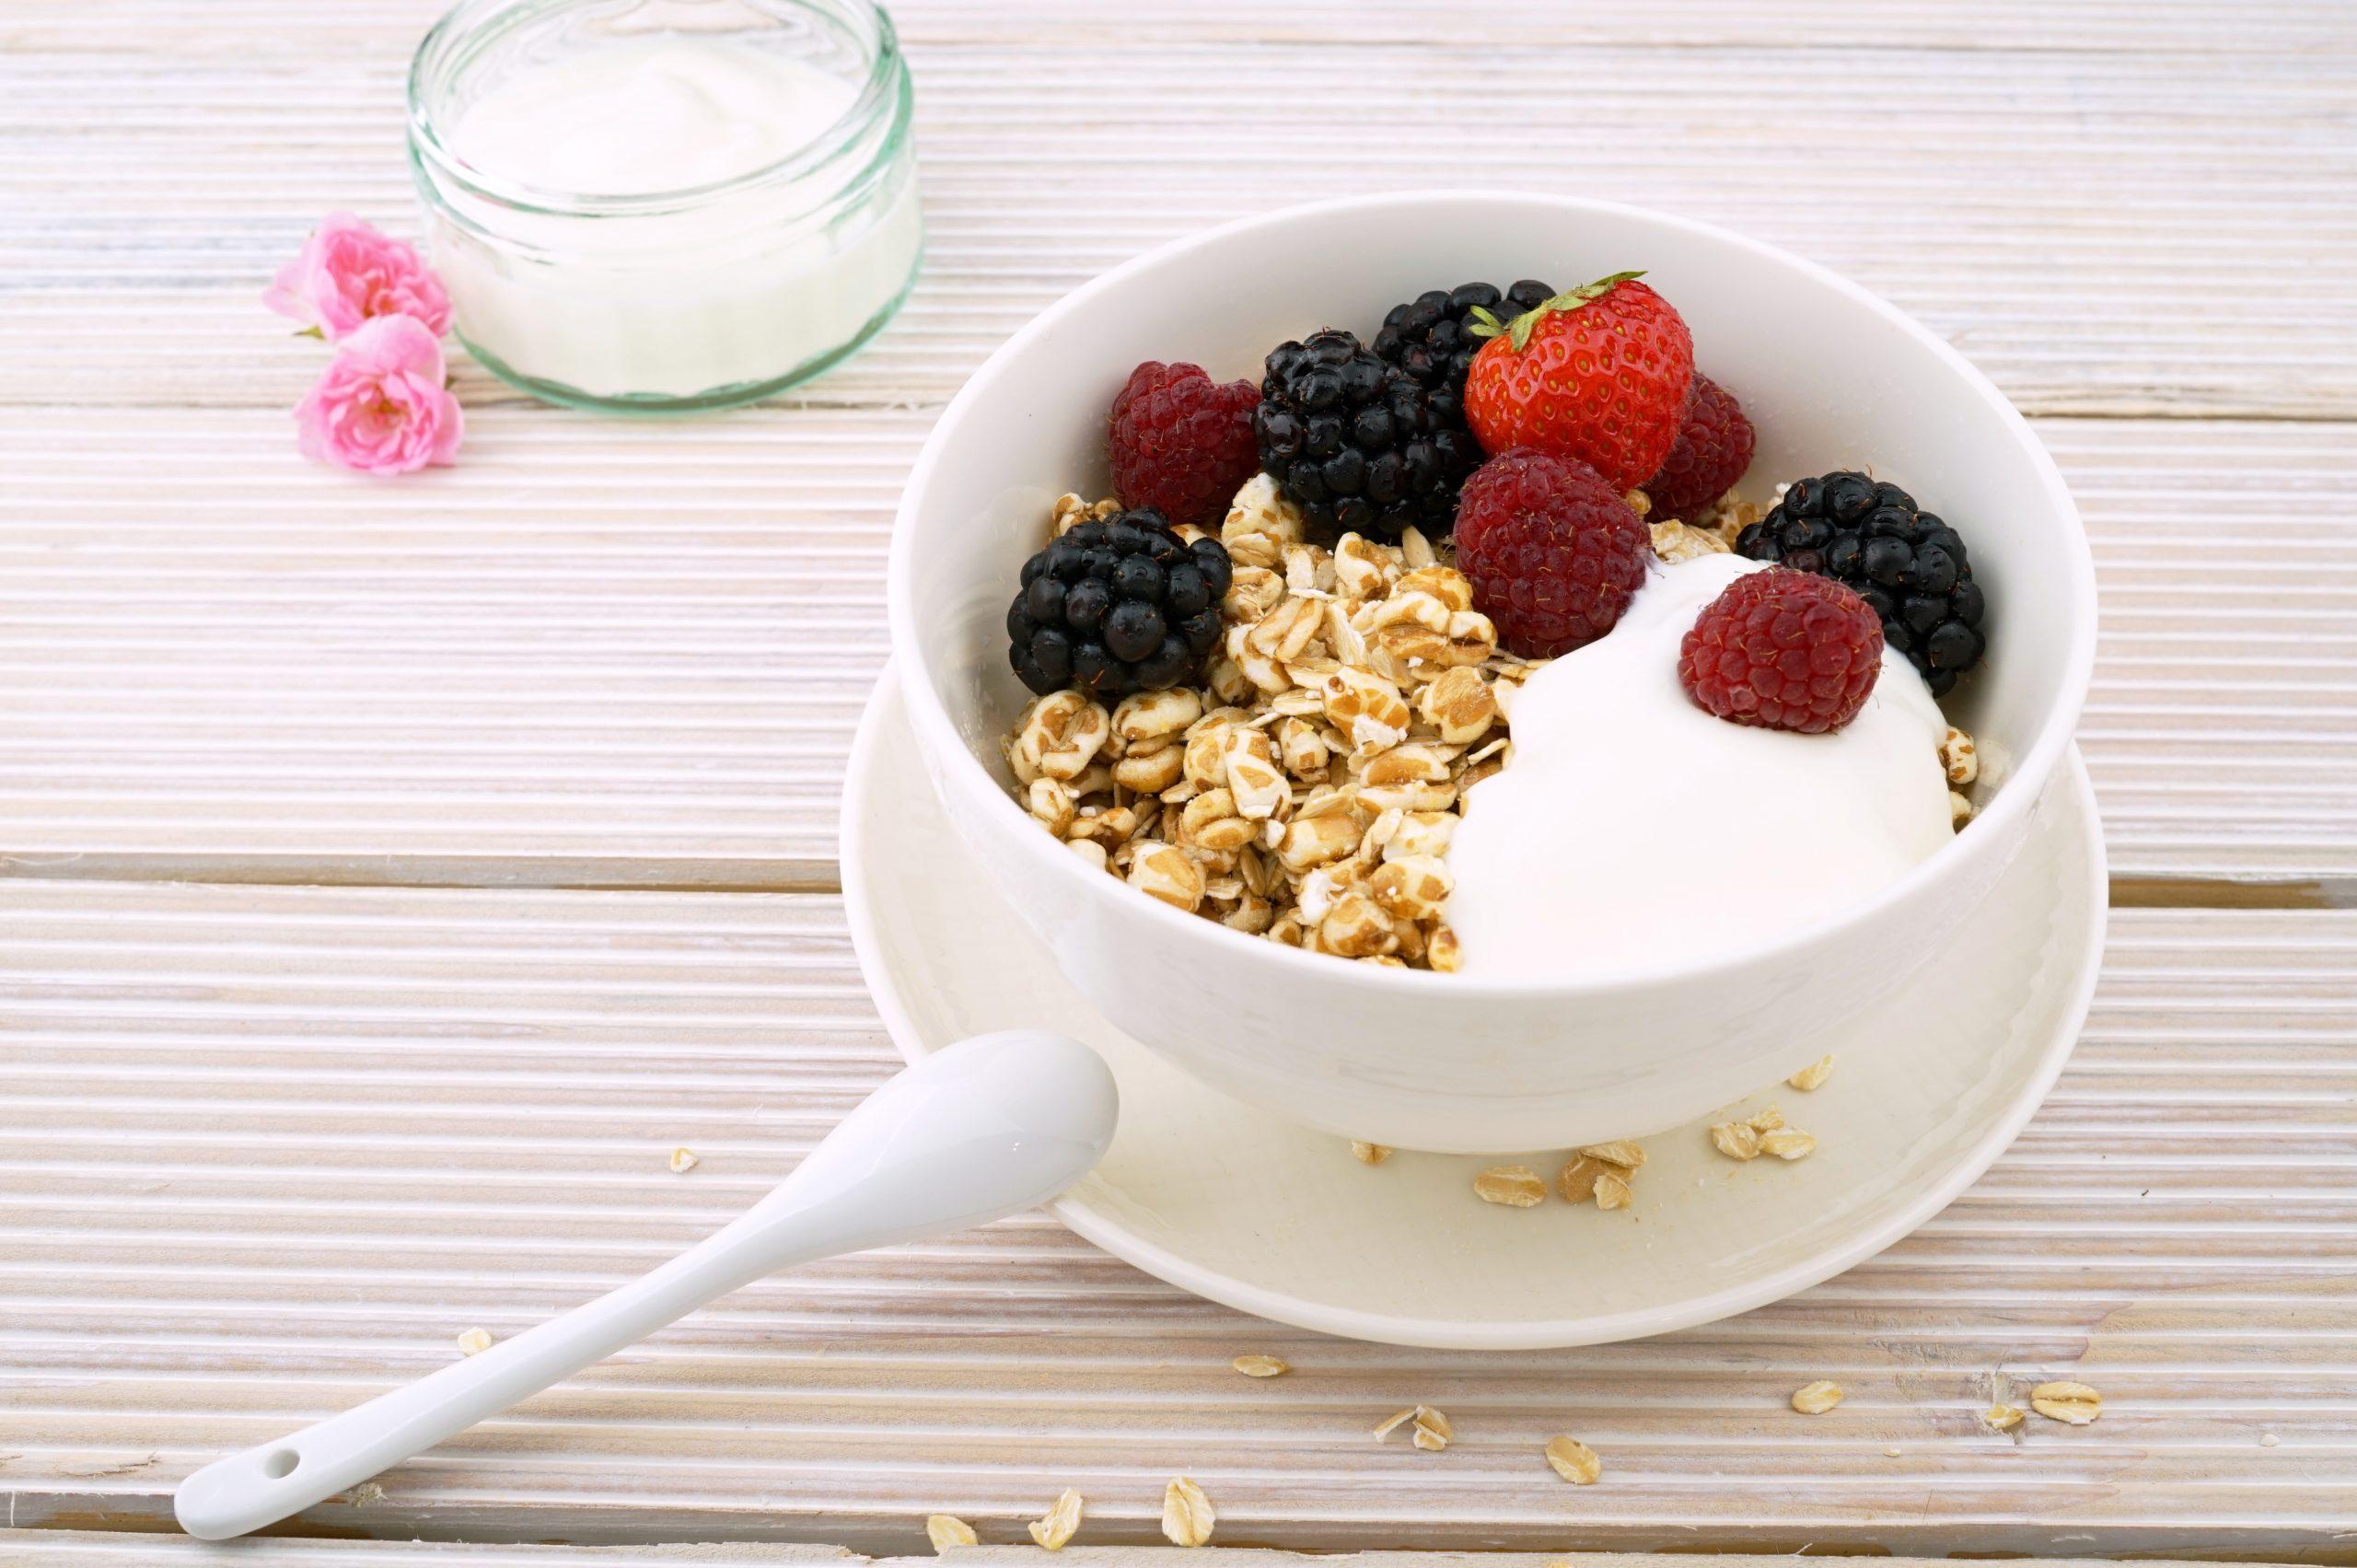 Bowl of yogurt and fruit